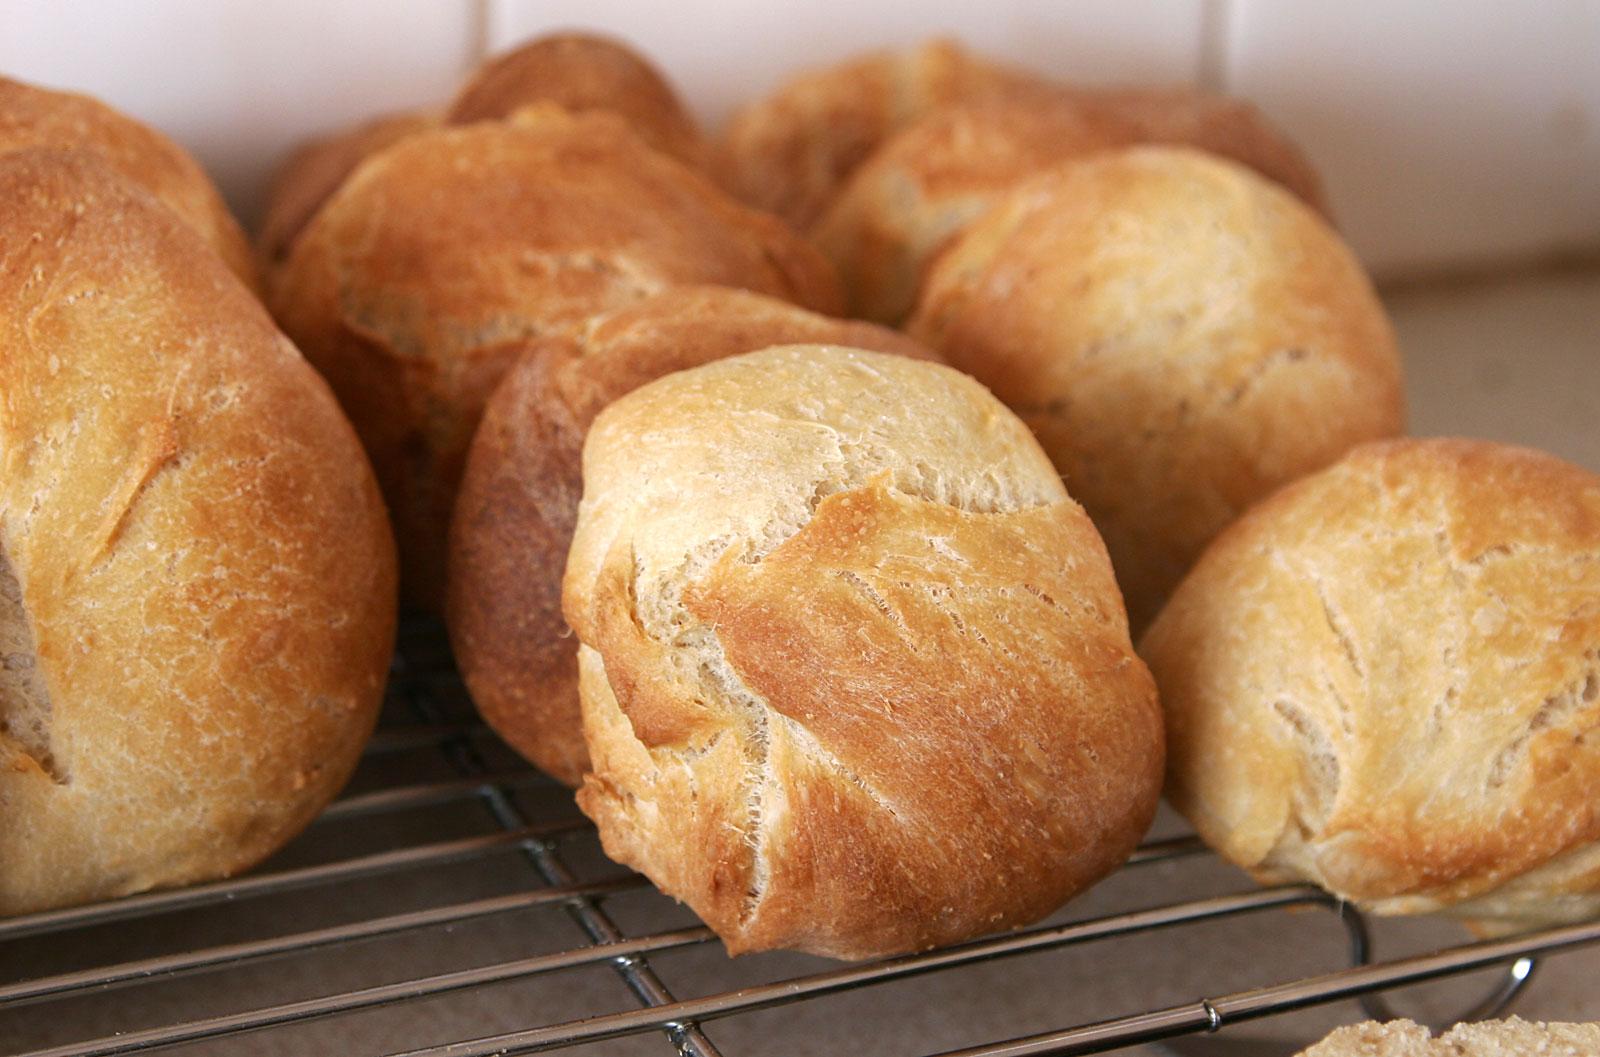 File:Bread rolls.jpg - Wikimedia - 256.3KB